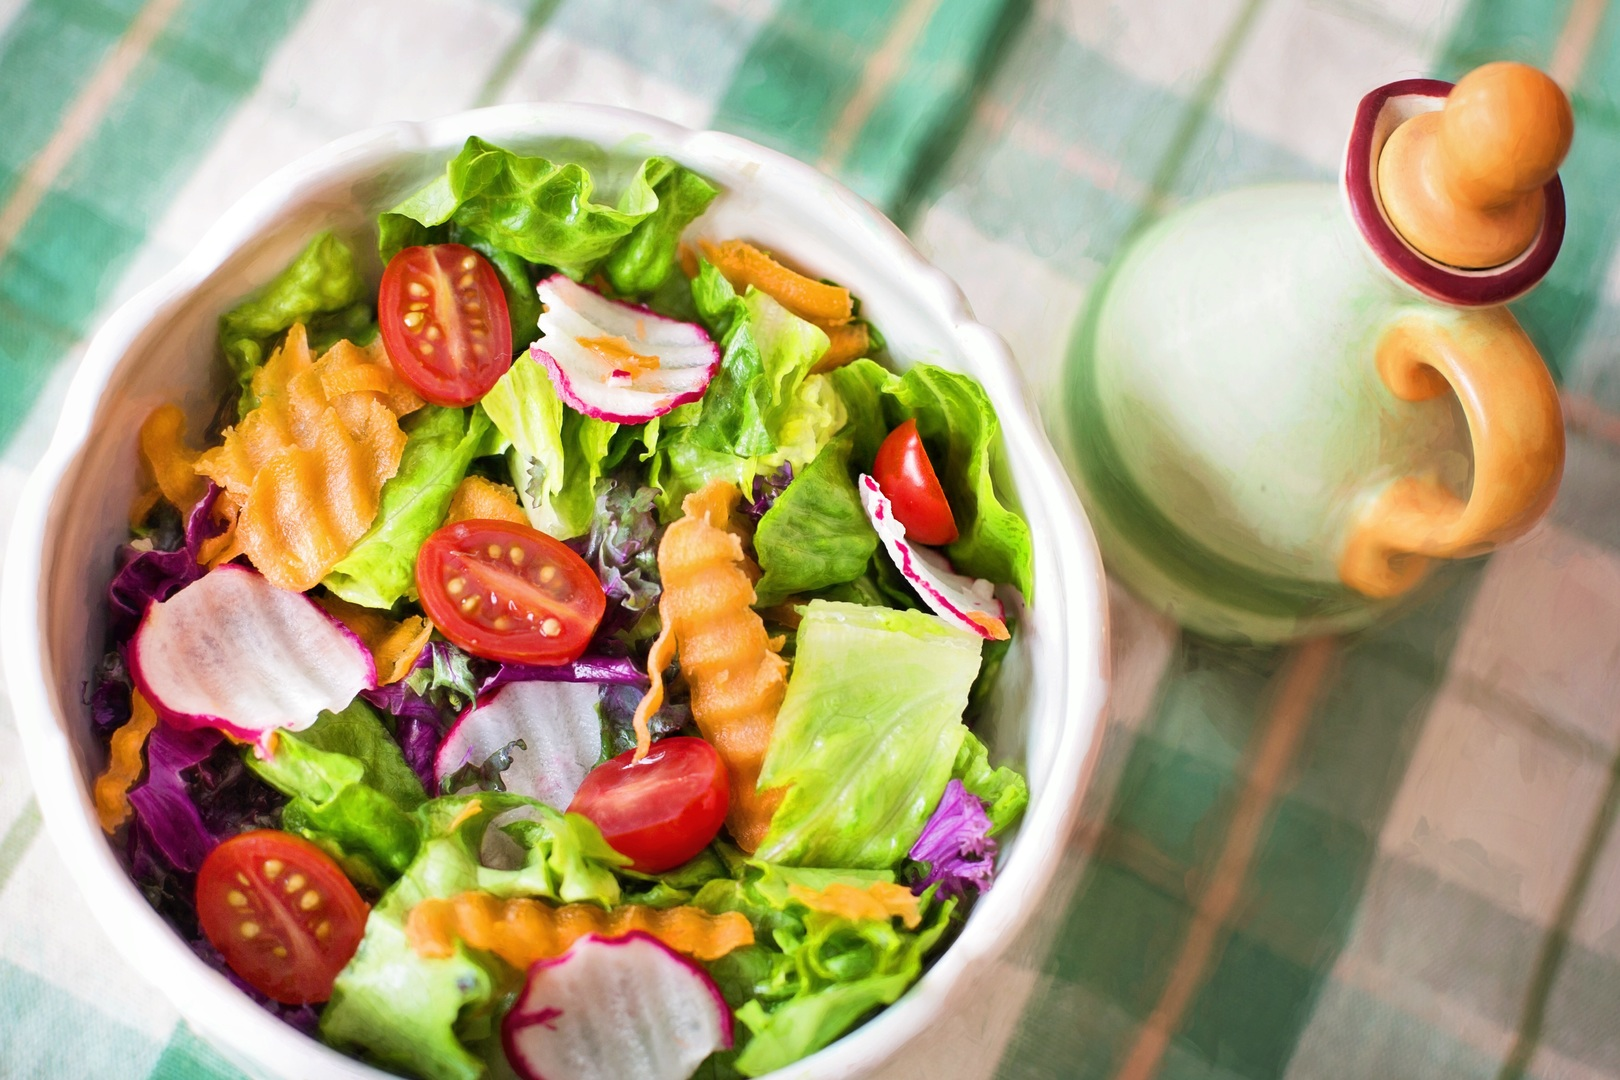 cuarentena dieta